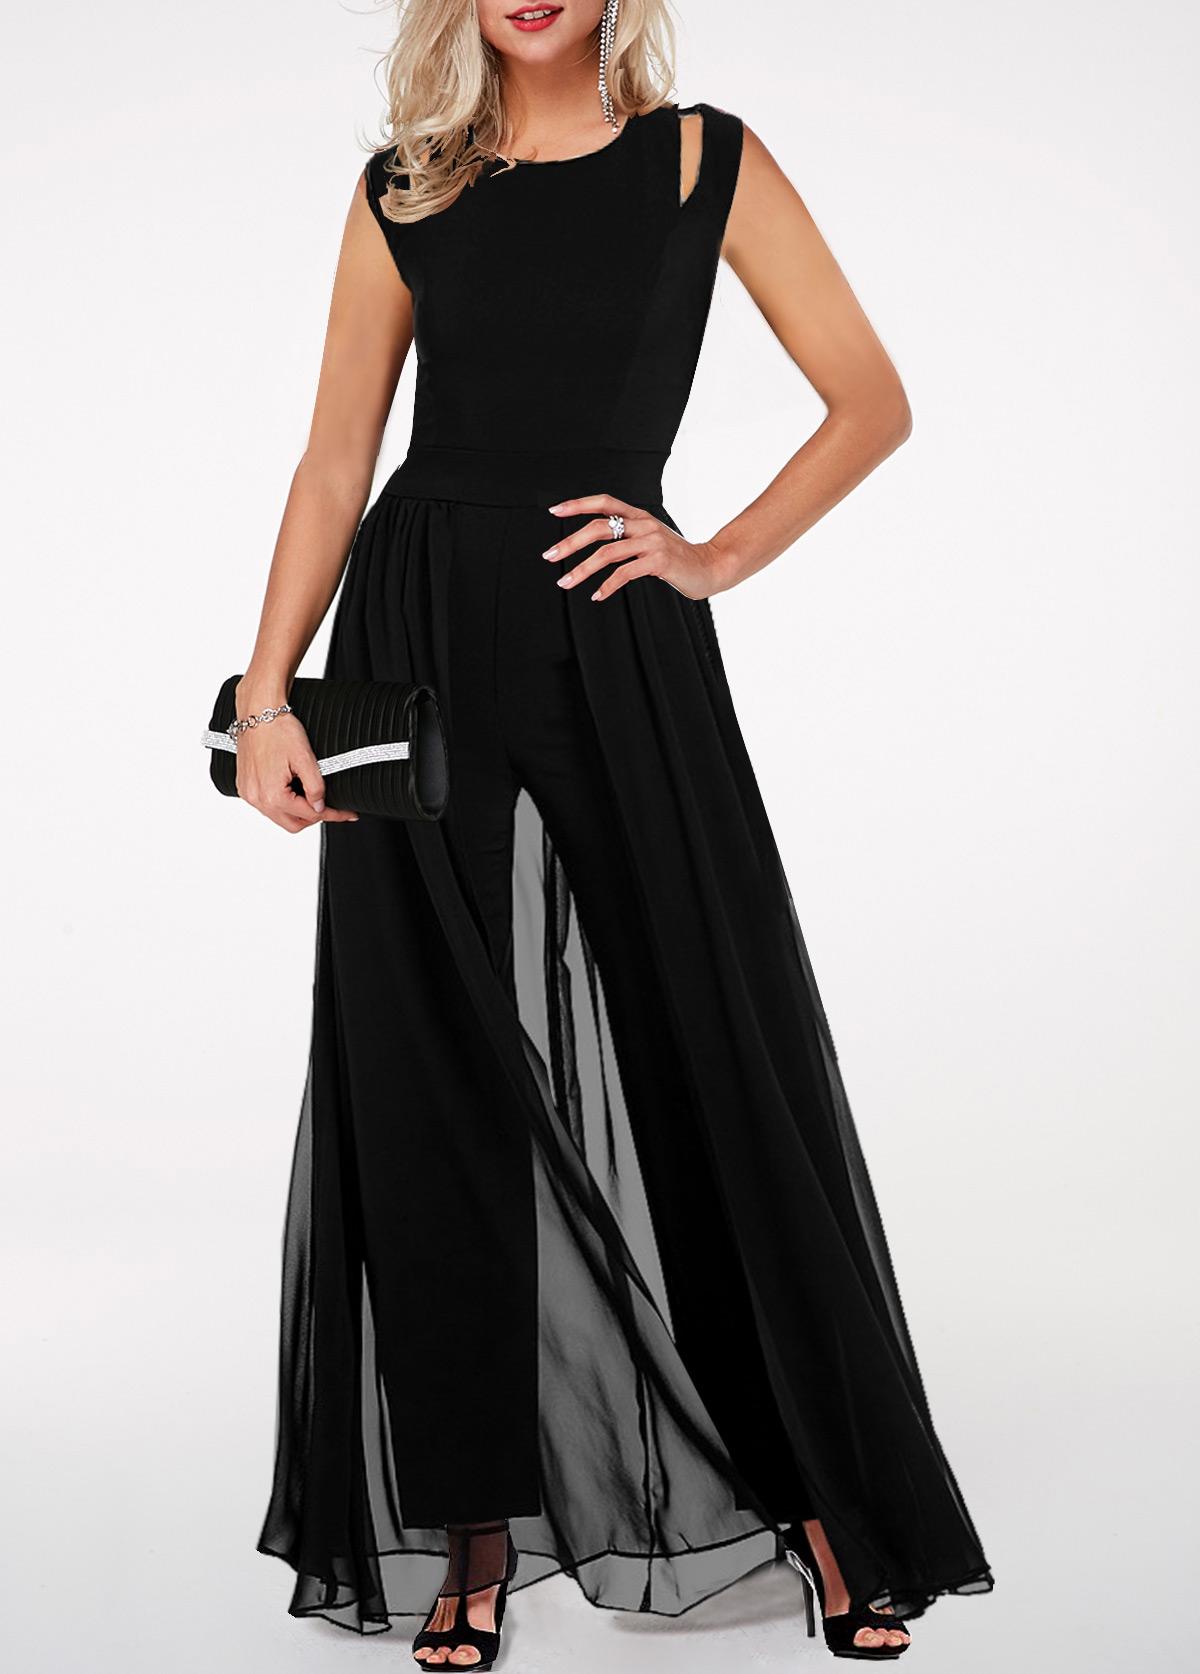 Black High Waist Round Neck Chiffon Overlay Jumpsuit